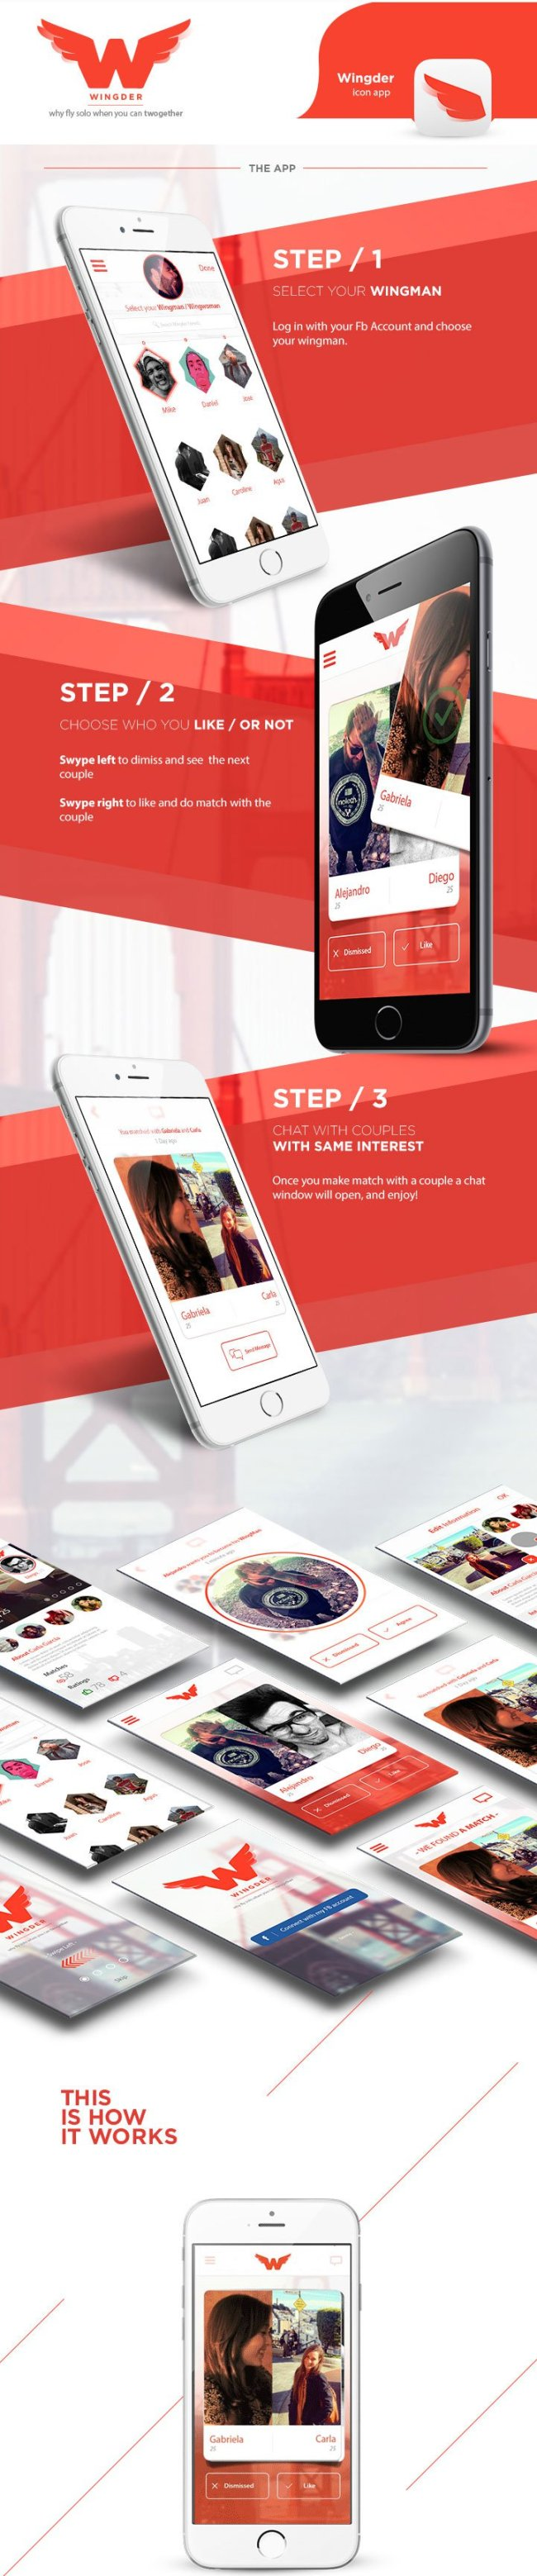 Wingder-UIX-social-Mobile-App